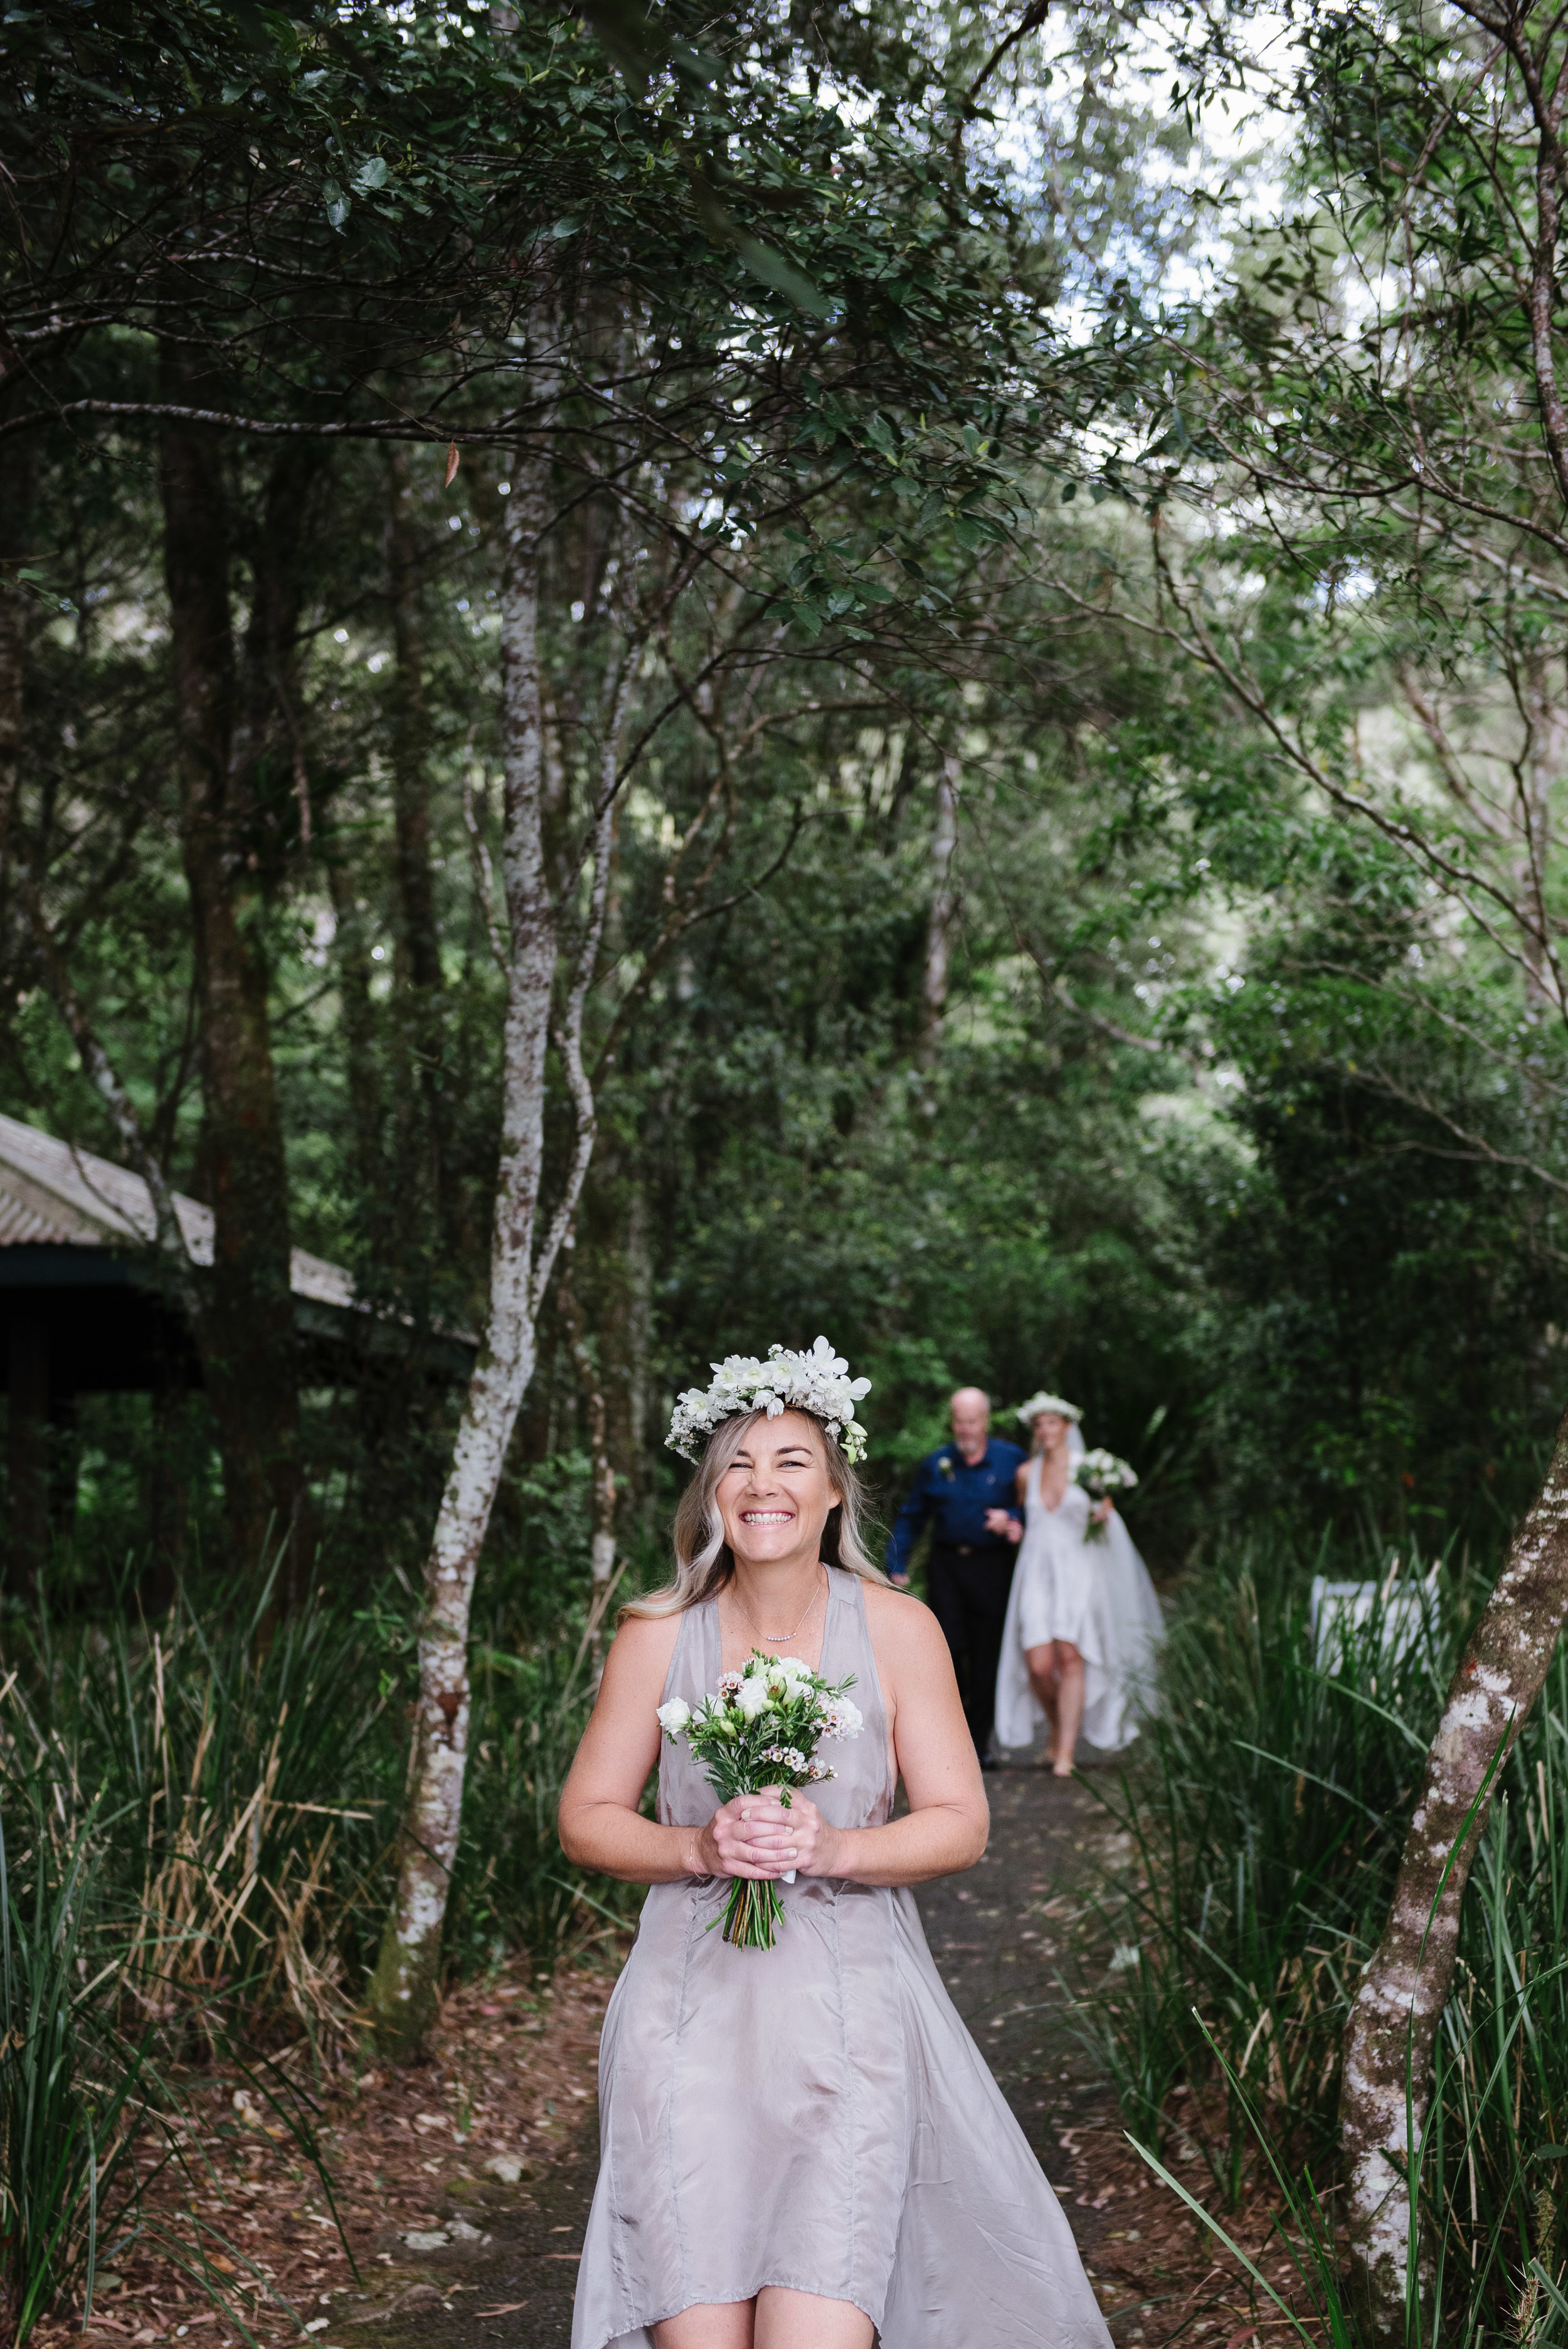 Carla and Luke- wedding photographer, byron bay wedding and family photographer, tweed heads wedding and family photography-147.jpg